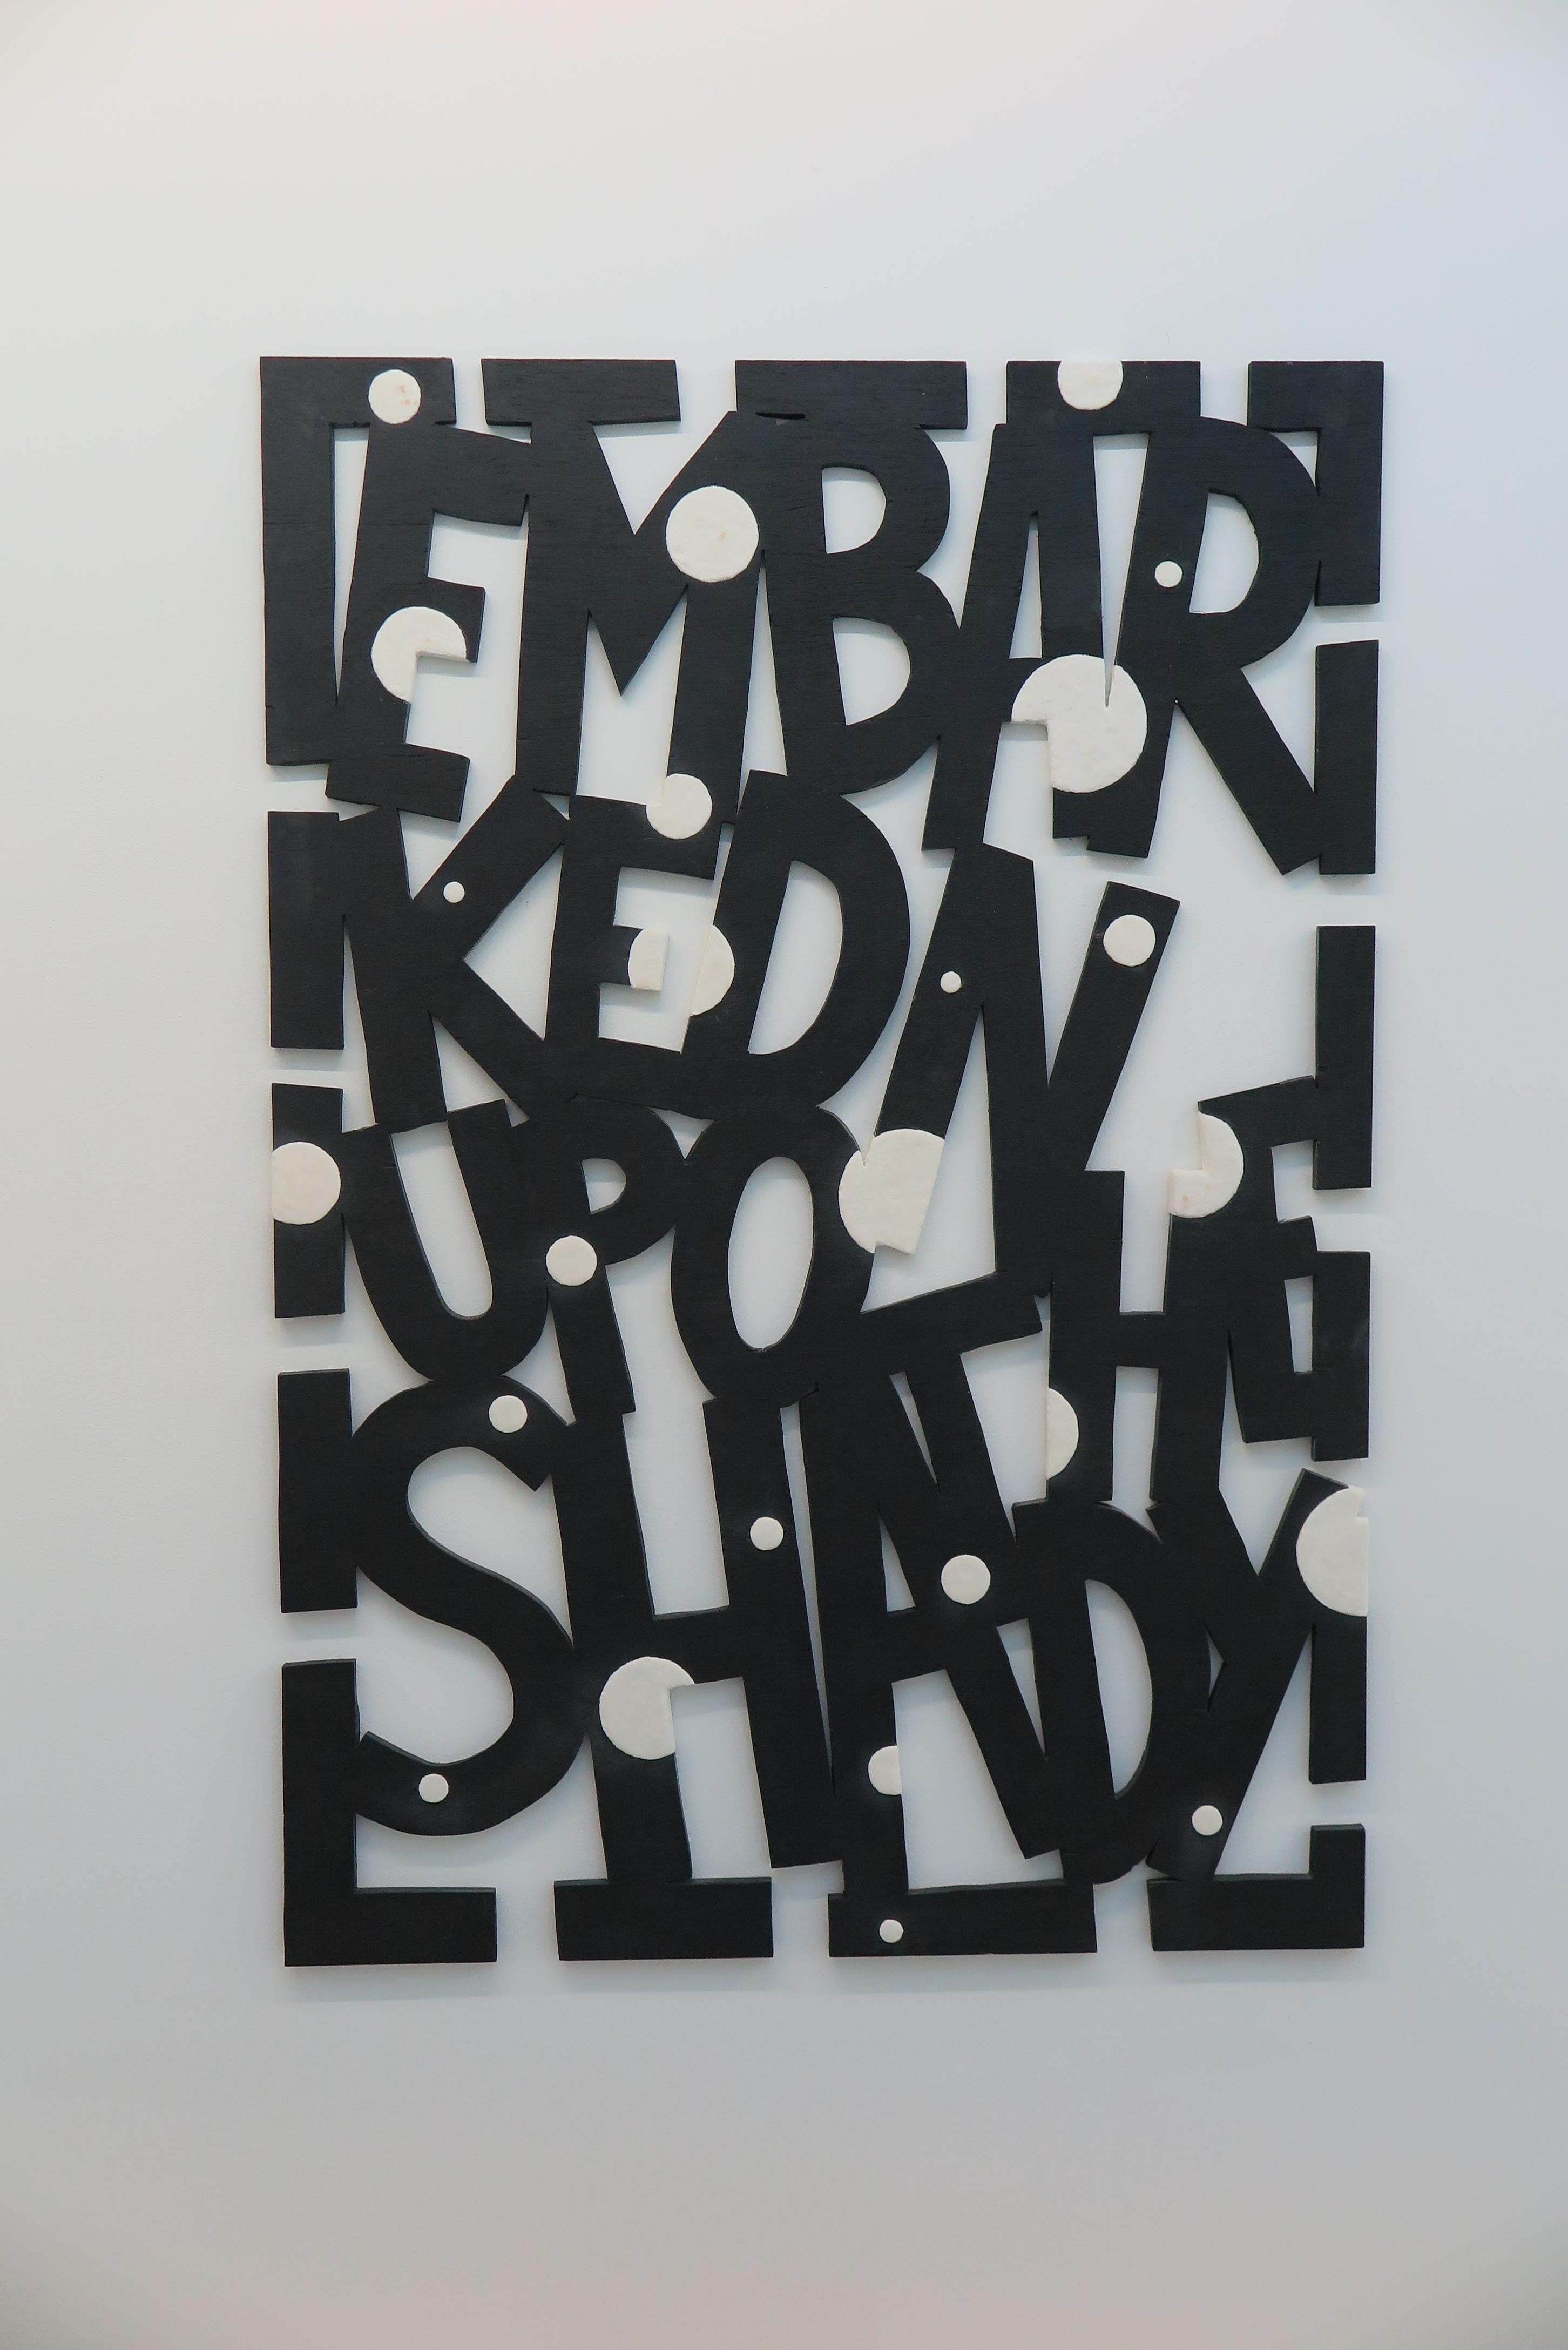 Gerard Koek - Words 48 - 2016